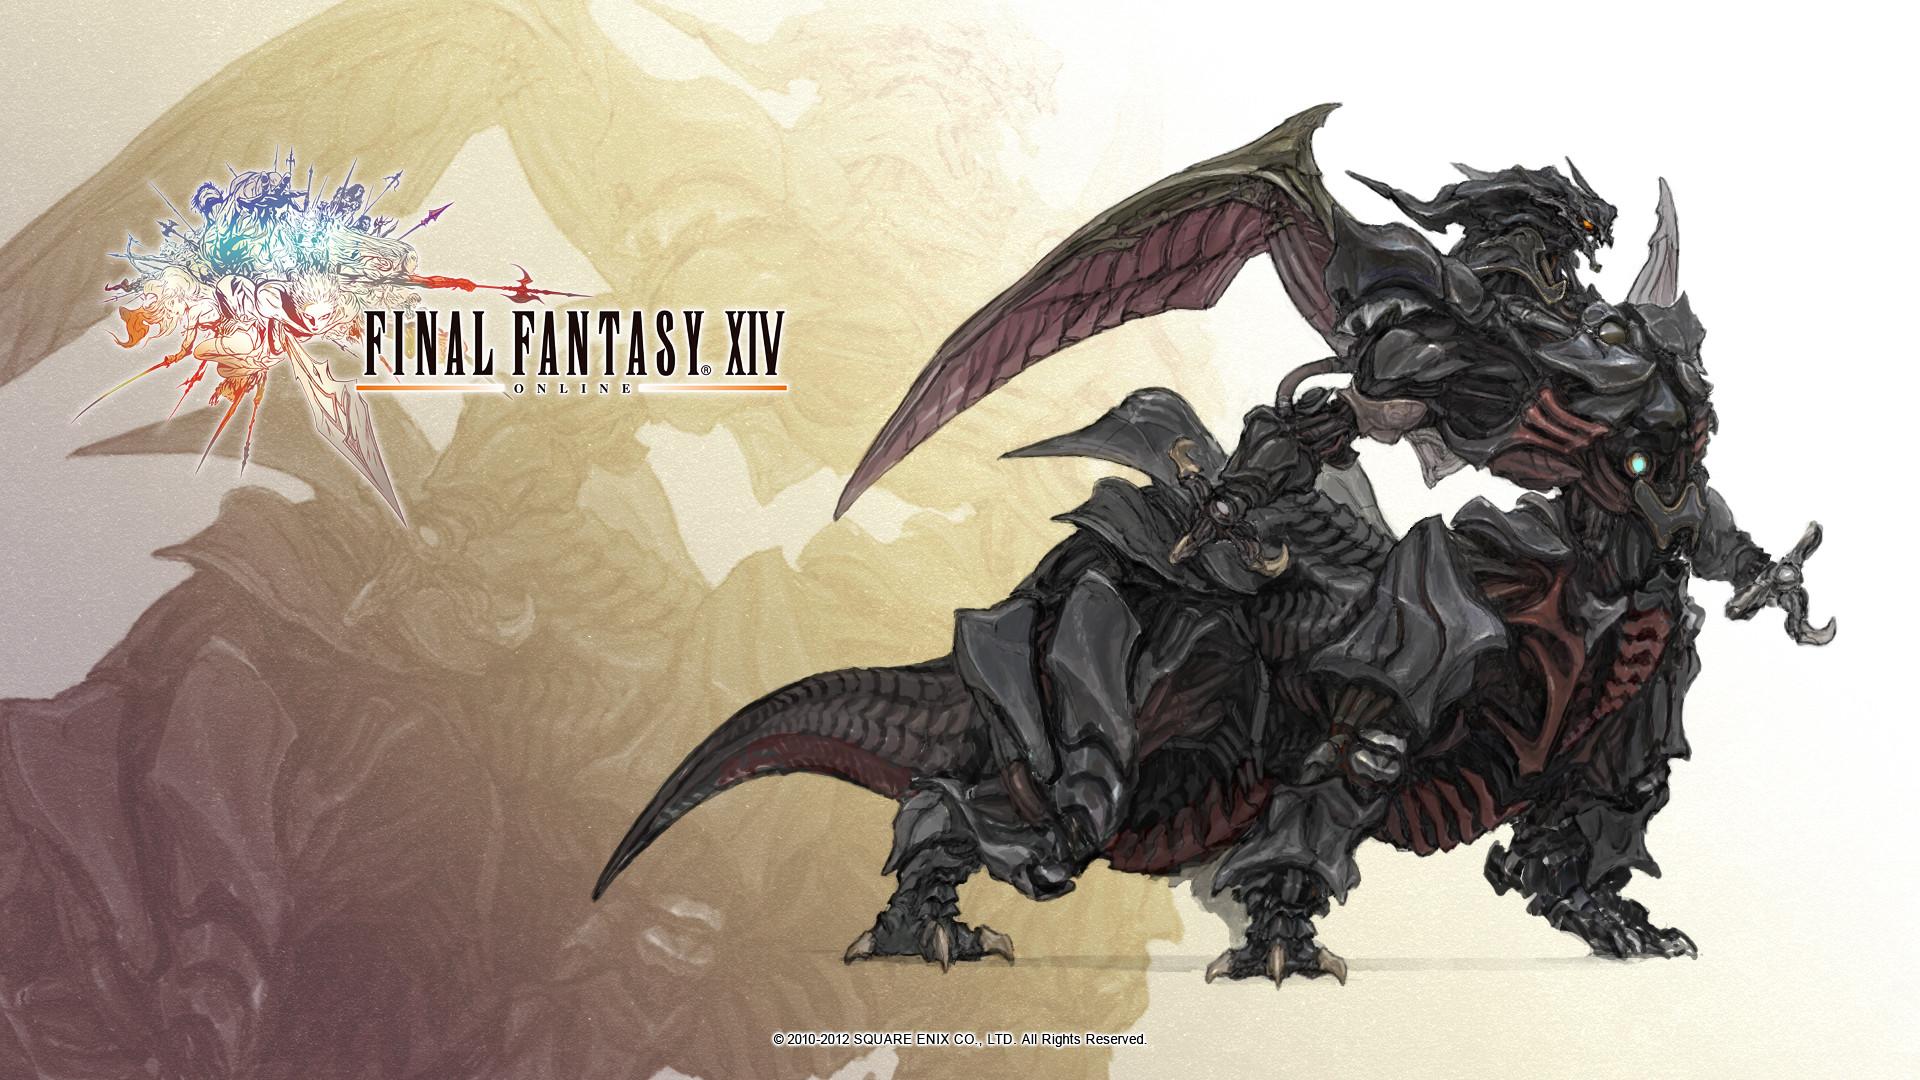 Final Fantasy XIV wallpapers | Final Fantasy Wiki | FANDOM powered by Wikia